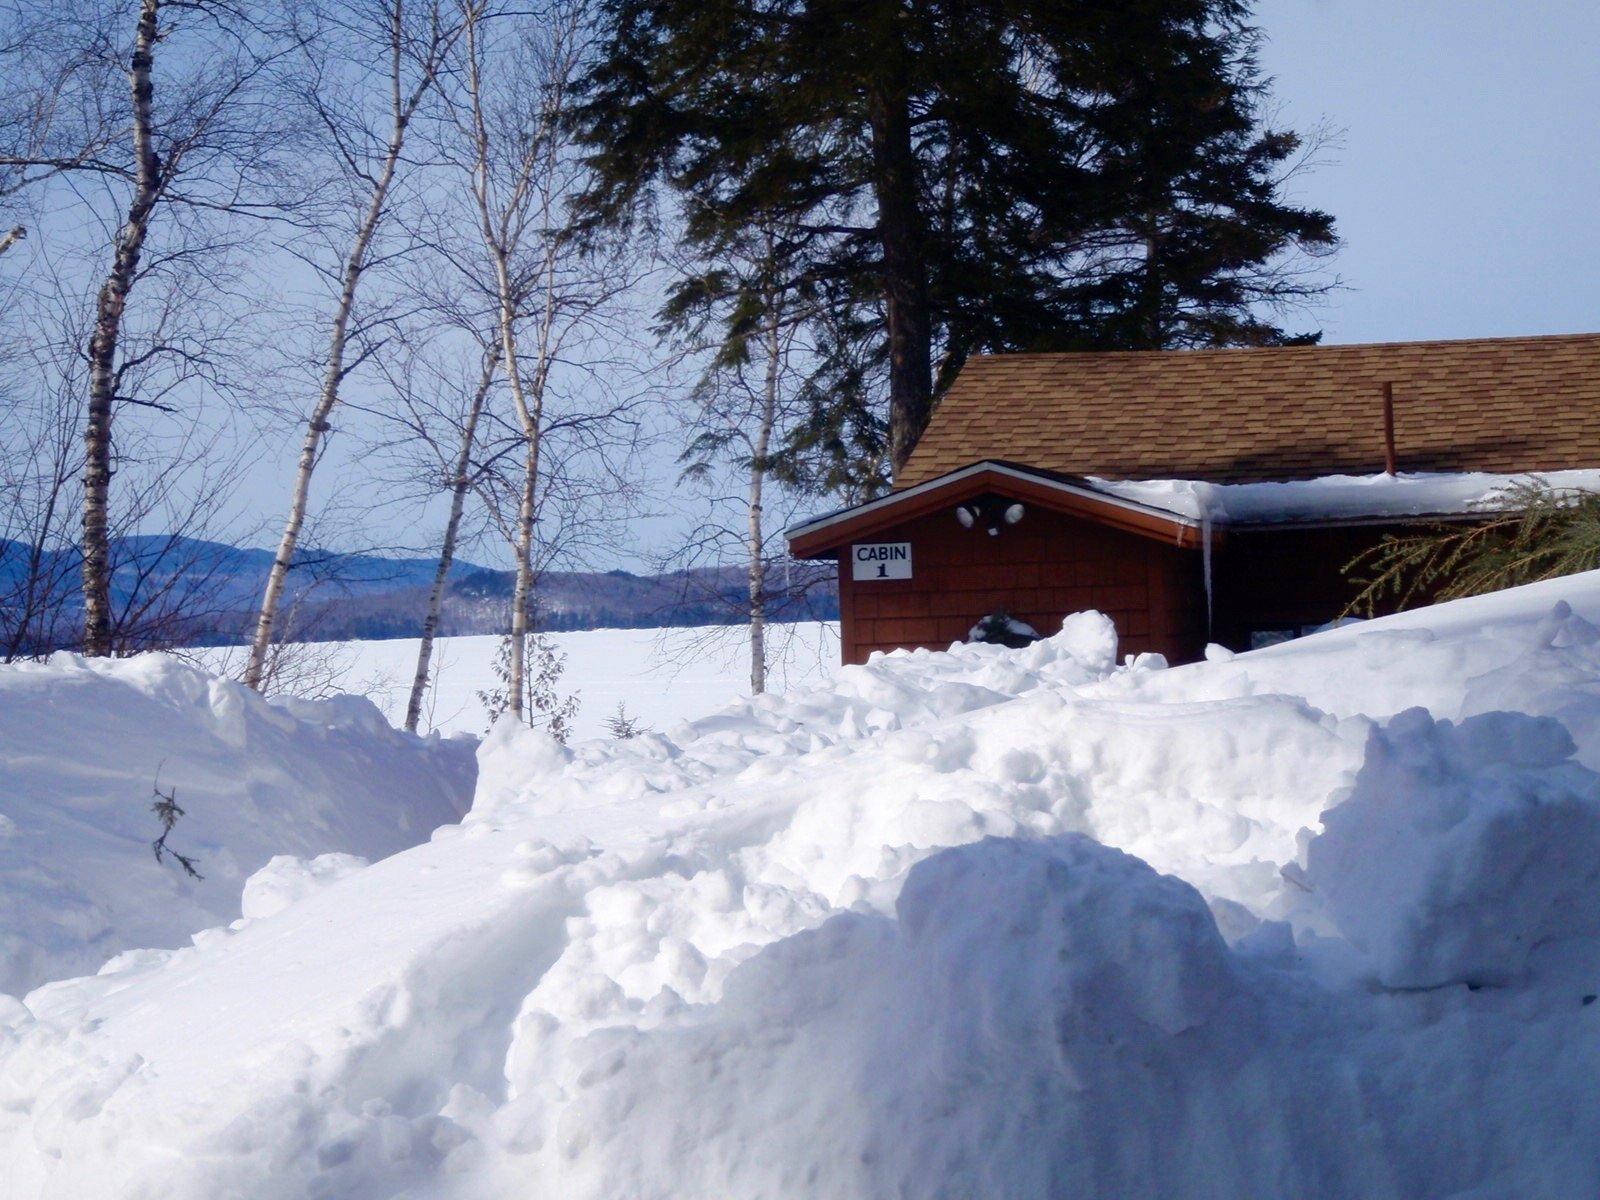 Winter Cabin Sightseeing